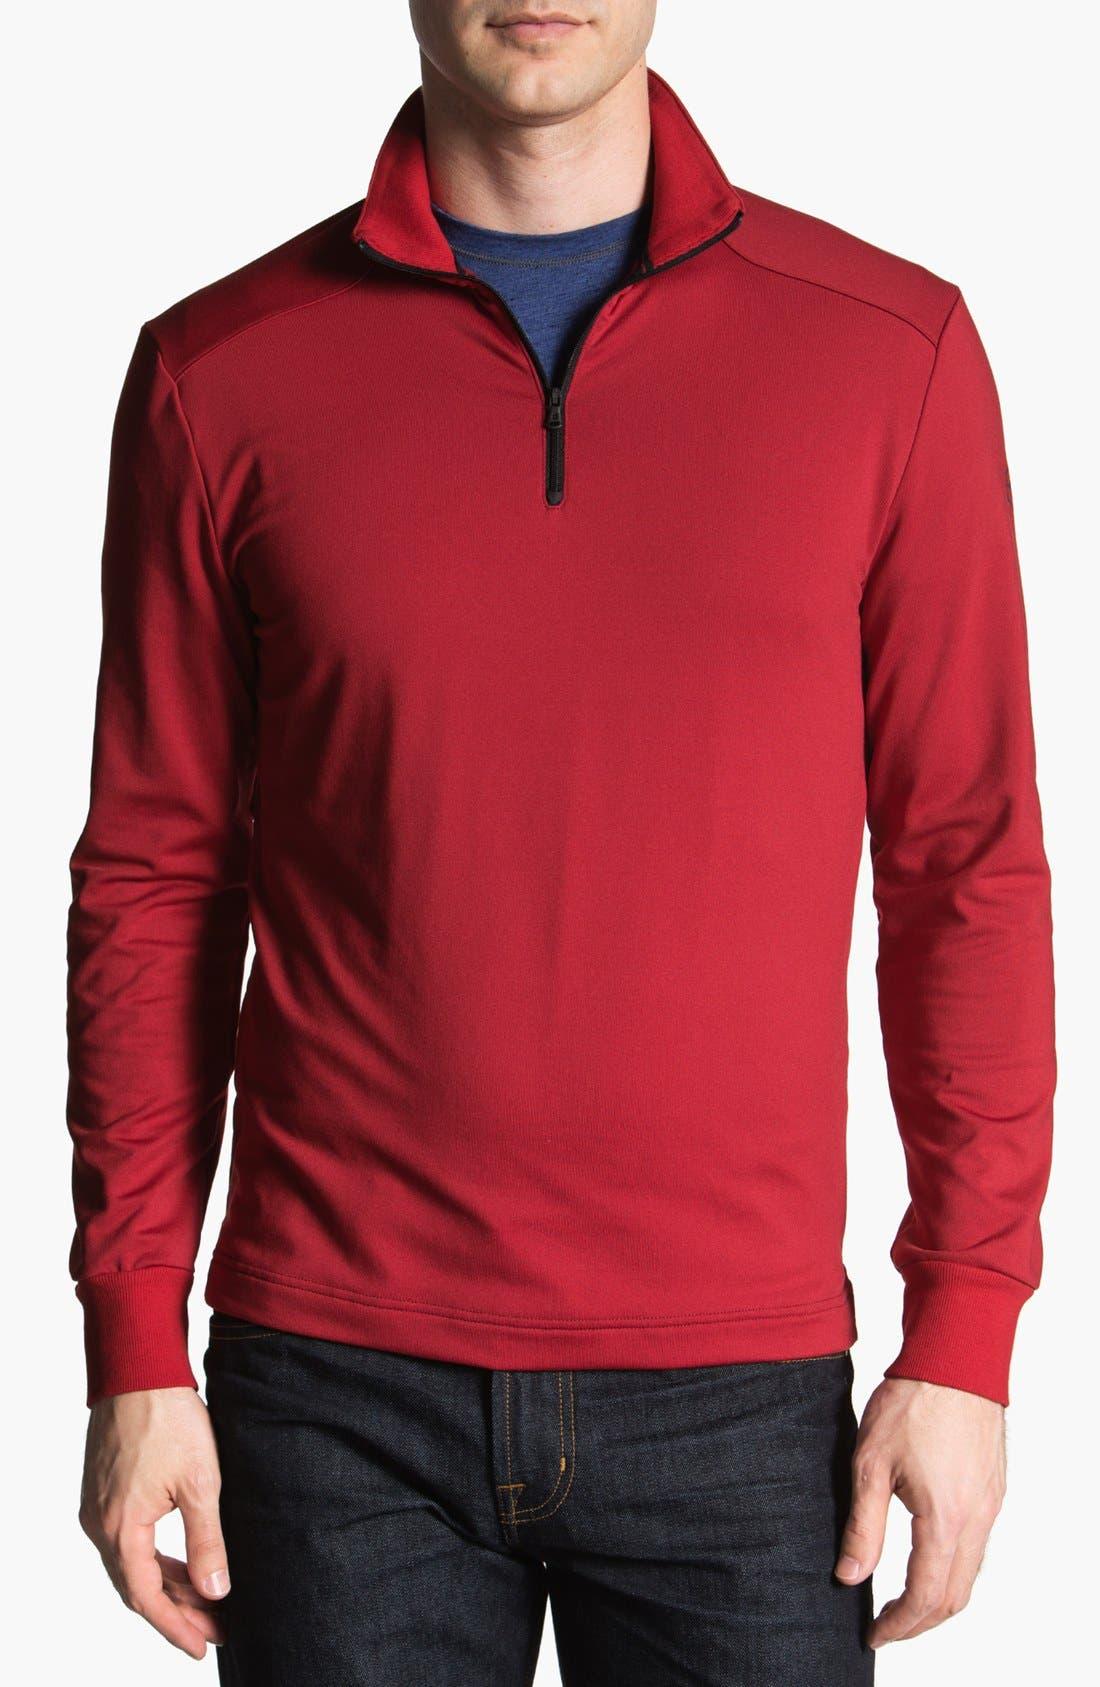 Alternate Image 1 Selected - Victorinox Swiss Army® 'Langden' Quarter Zip Fleece Pullover